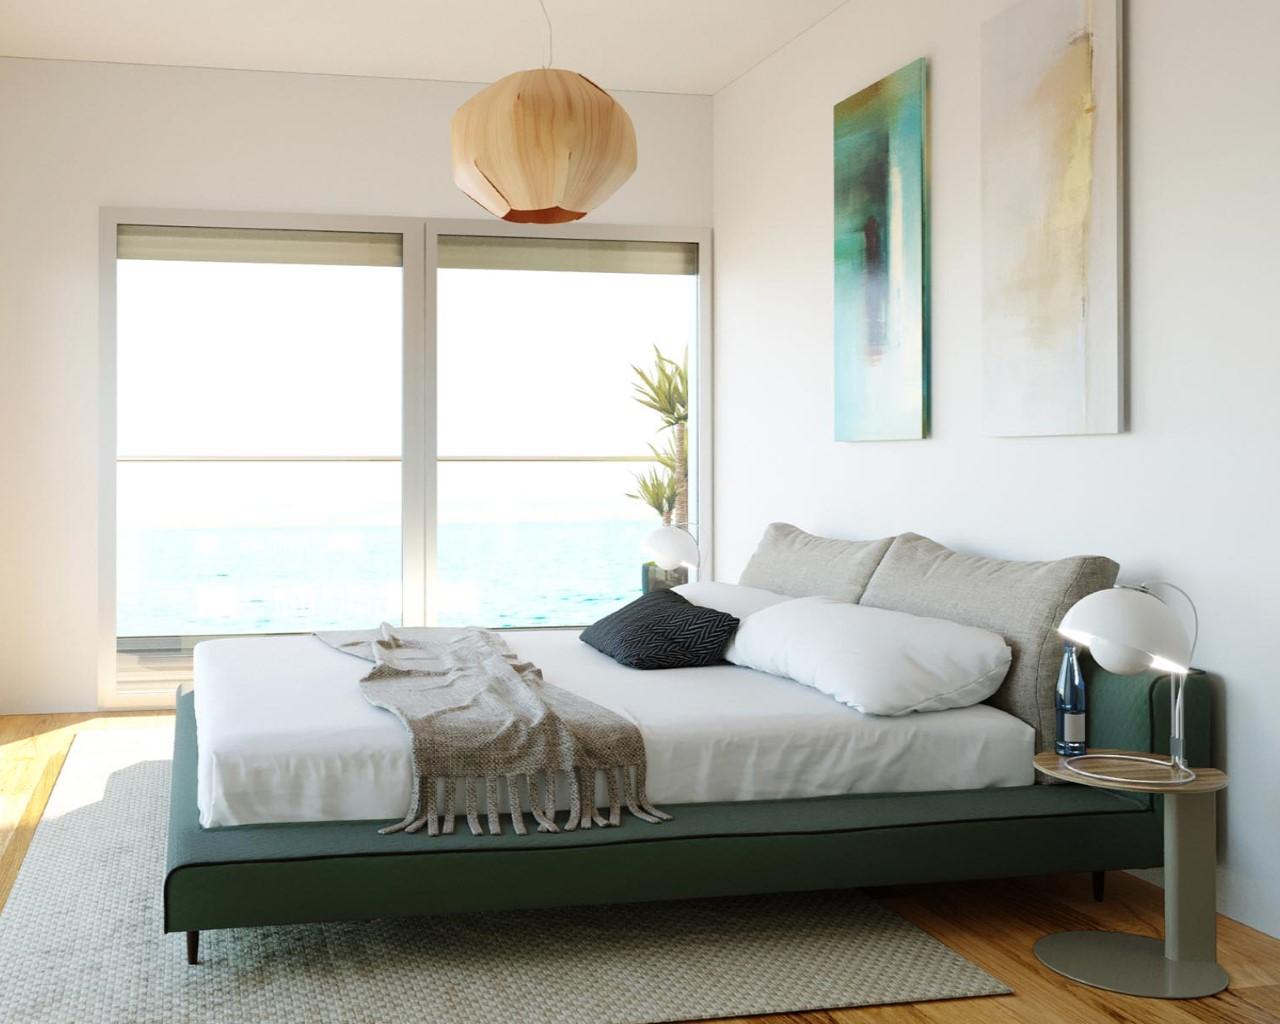 Tagus Bay - Bedroom